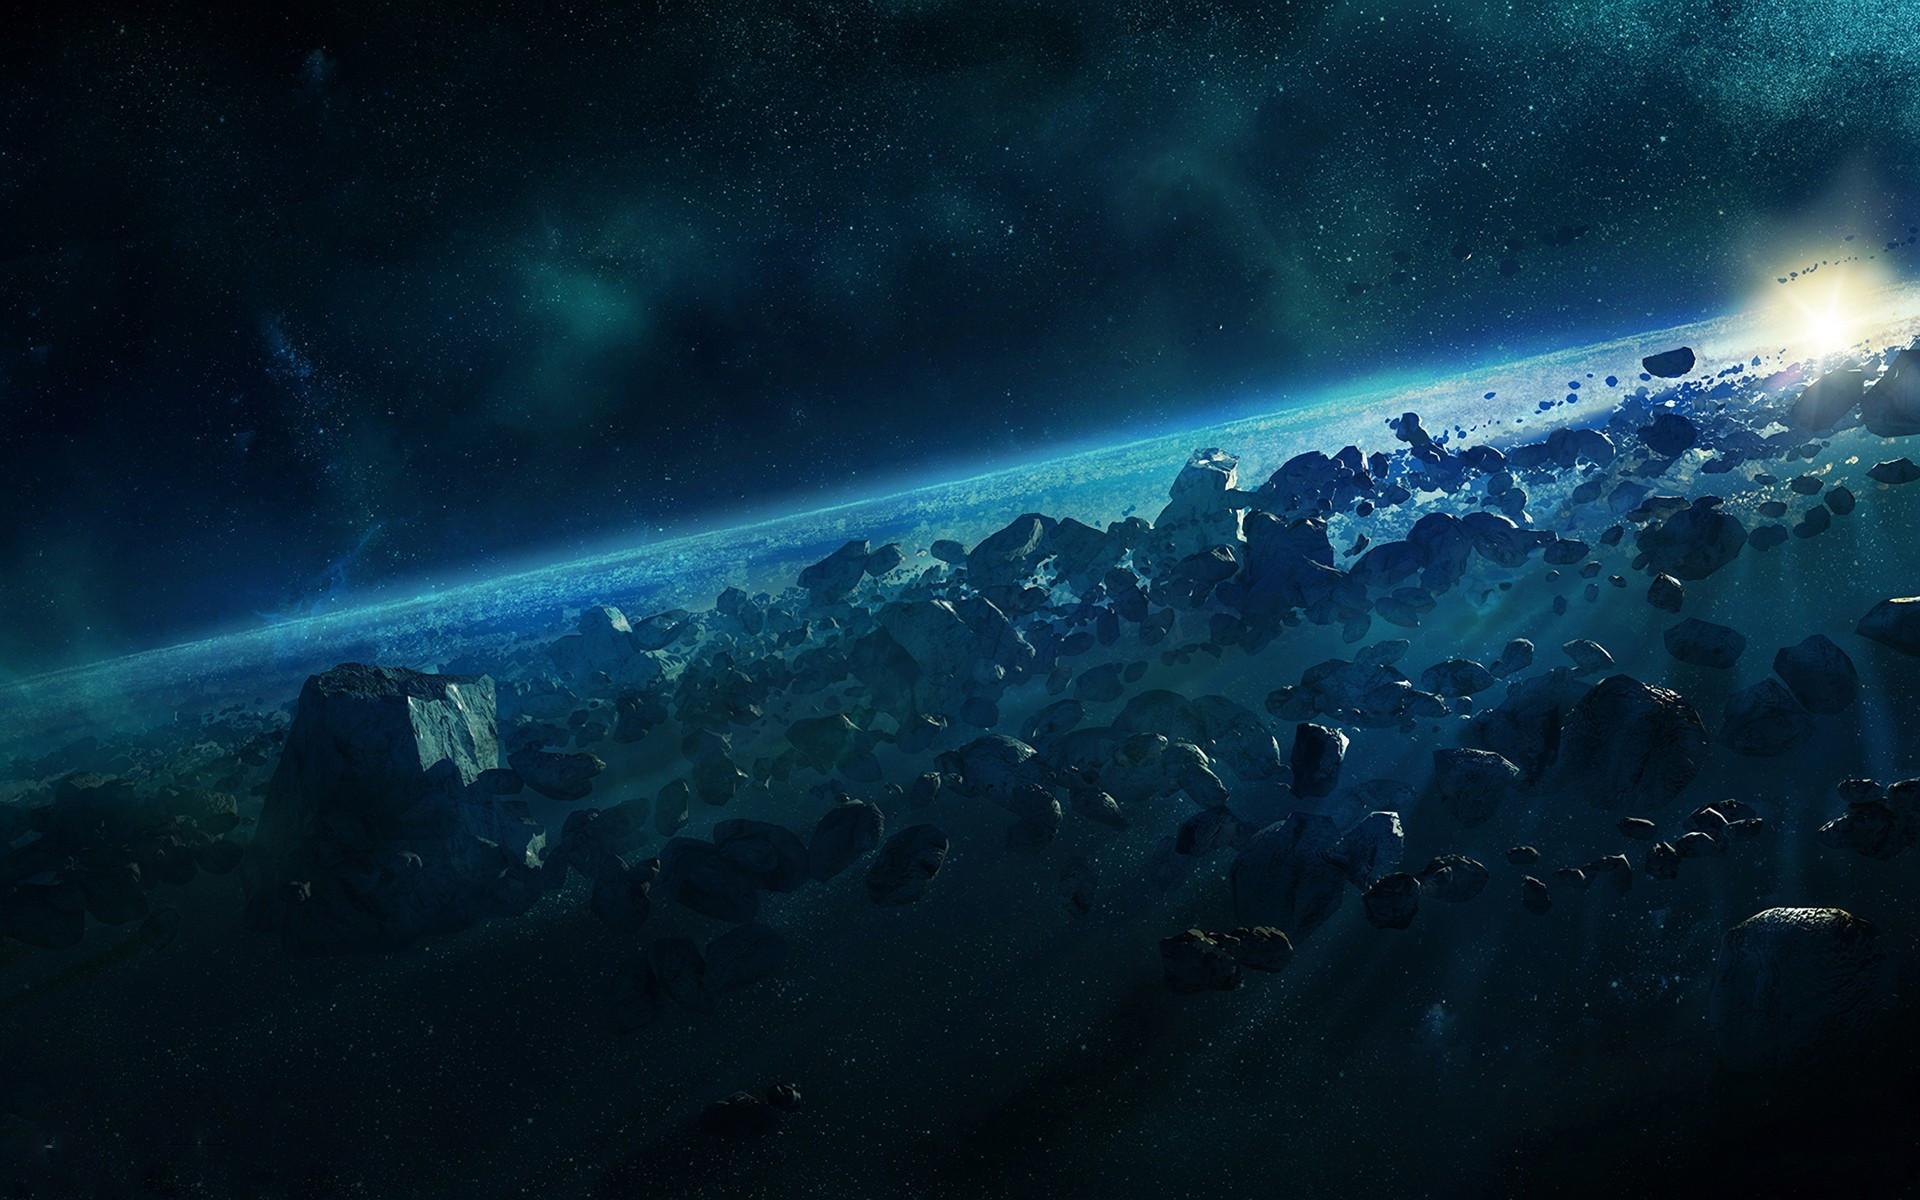 обои Астероидный пояс, метеориты, звезда картинки фото